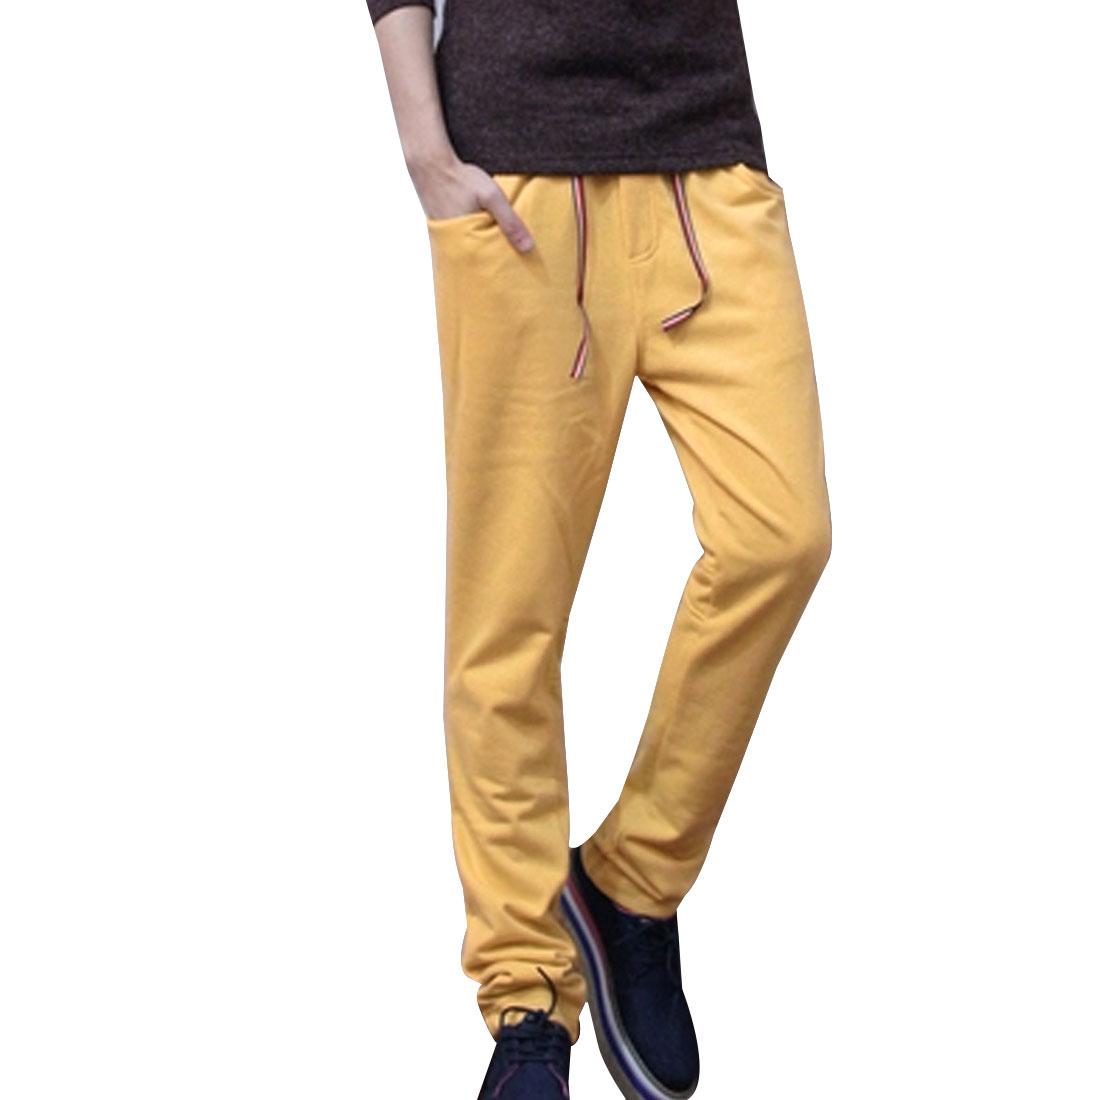 Mens Korea Fashion Low Waist Dark Yellow Leisure Sweatpants W27